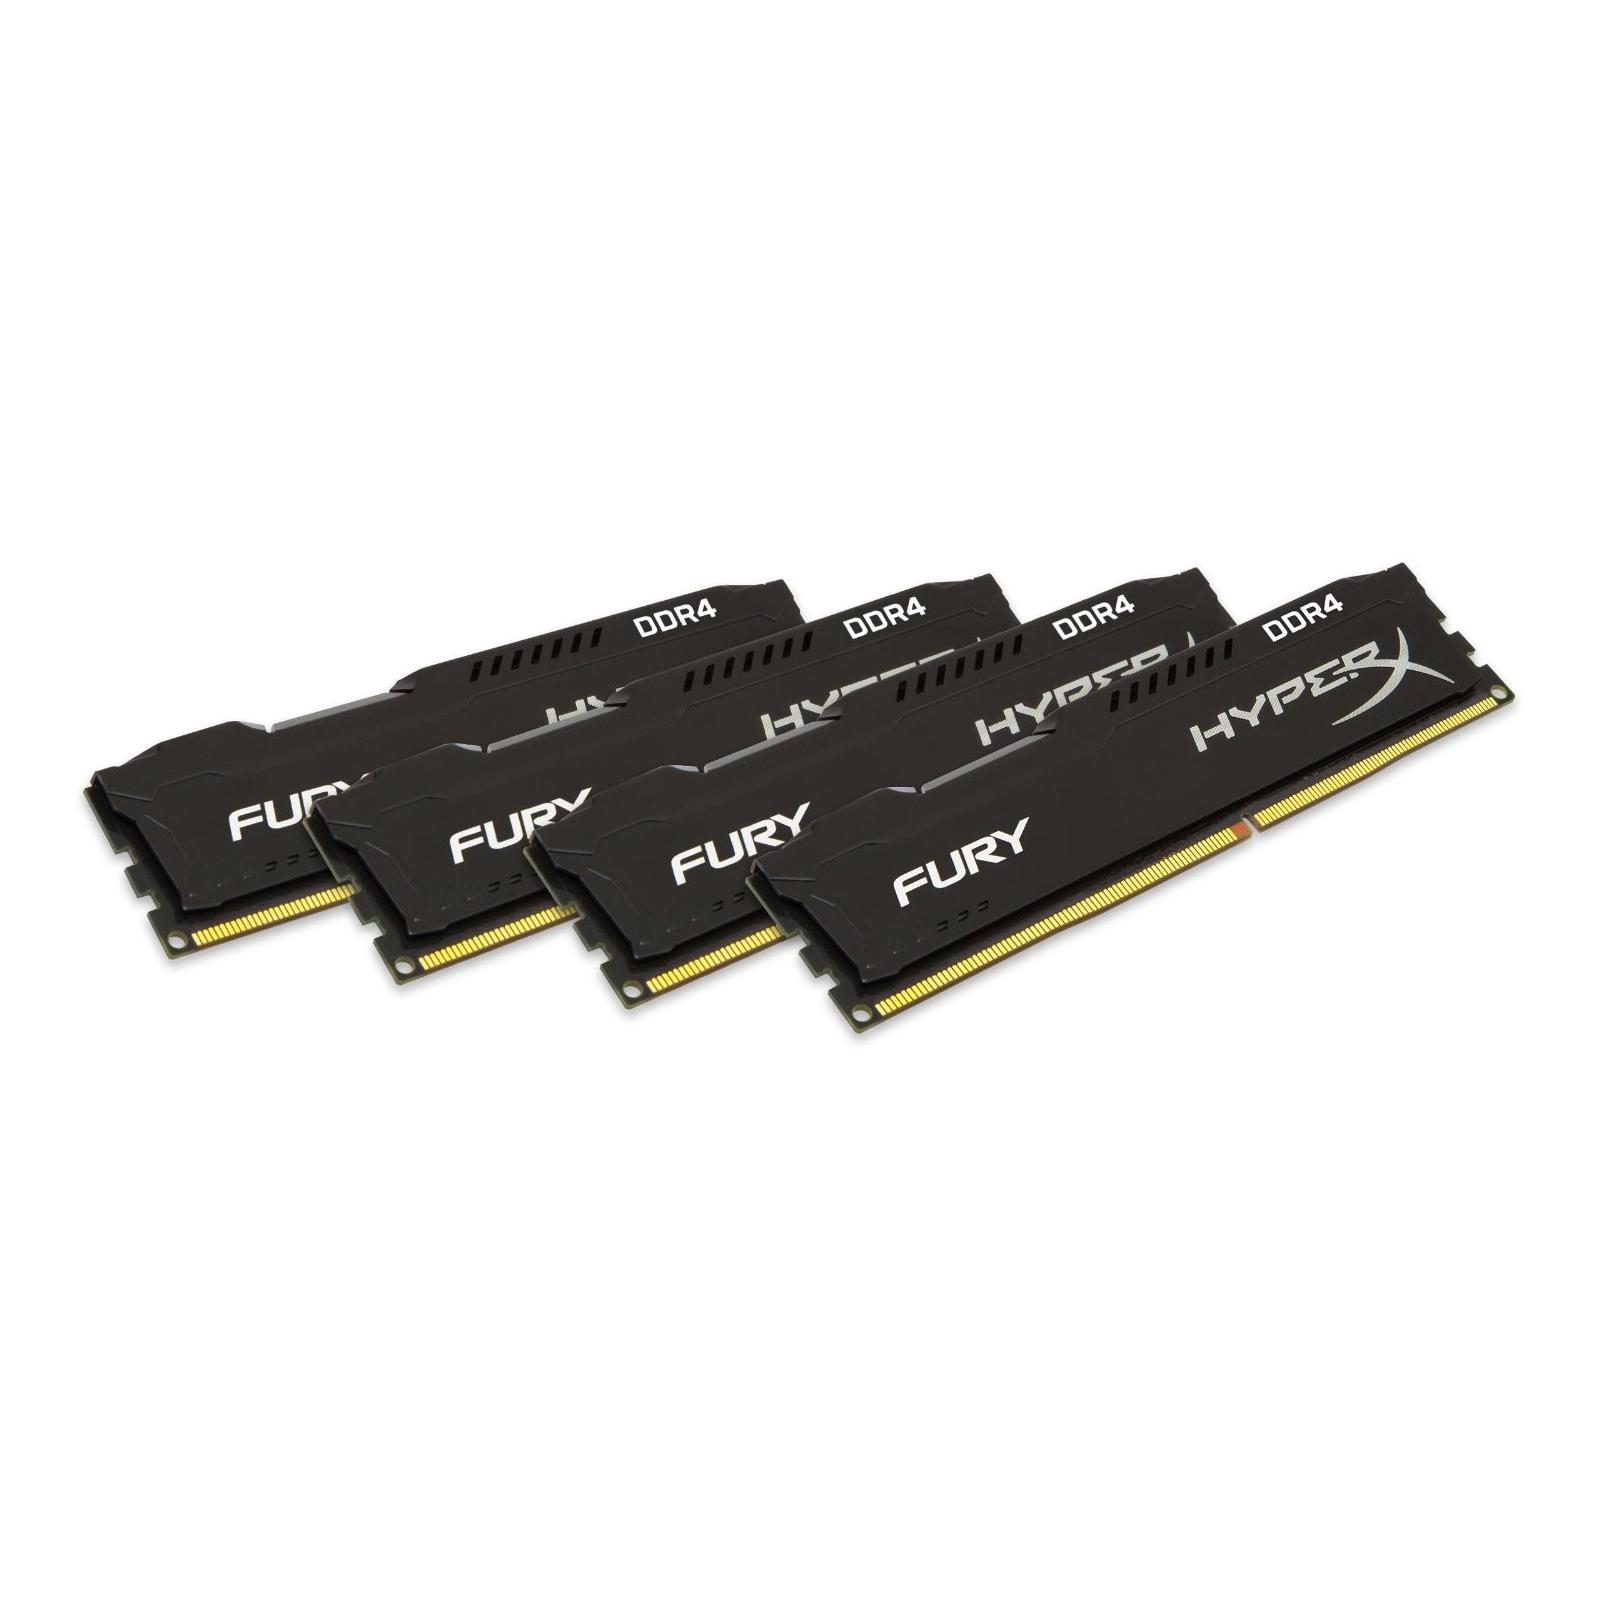 Модуль памяти для компьютера DDR4 32GB (4x8GB) 2400 MHz HyperX FURY Black Kingston (HX424C15FB2K4/32) изображение 2